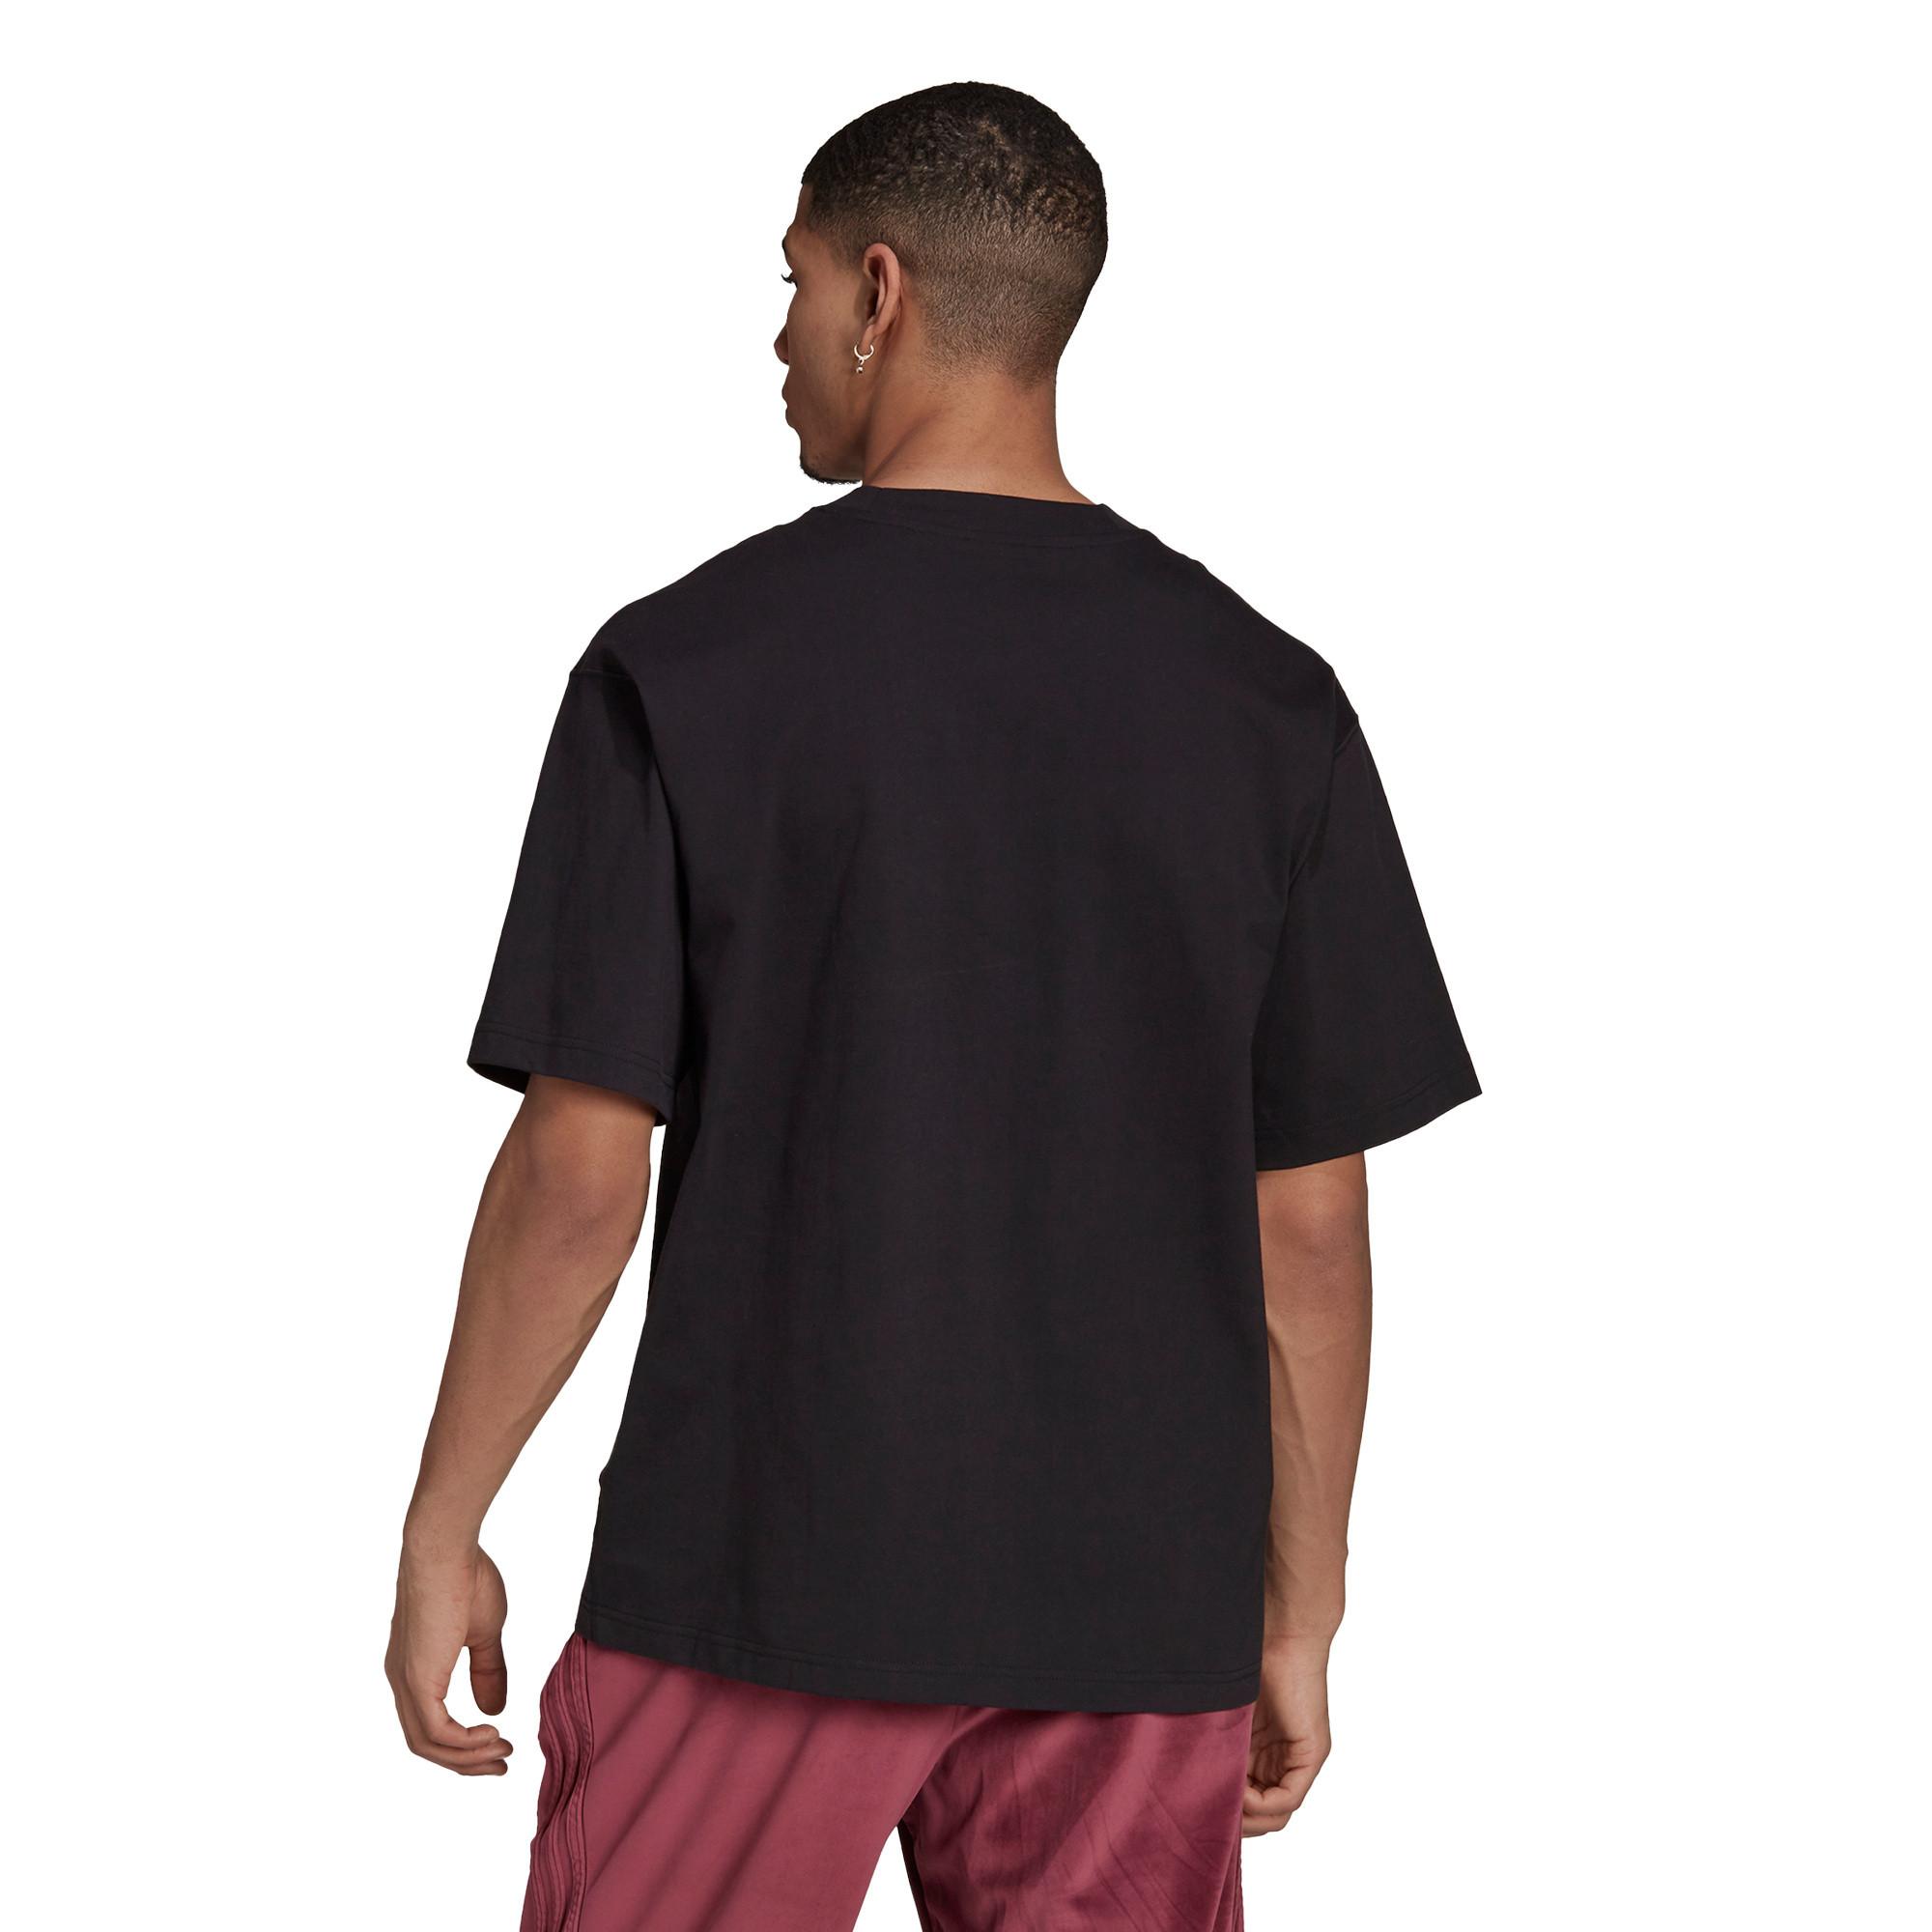 T-shirt uomo adicolor Trefoil, Nero, large image number 4